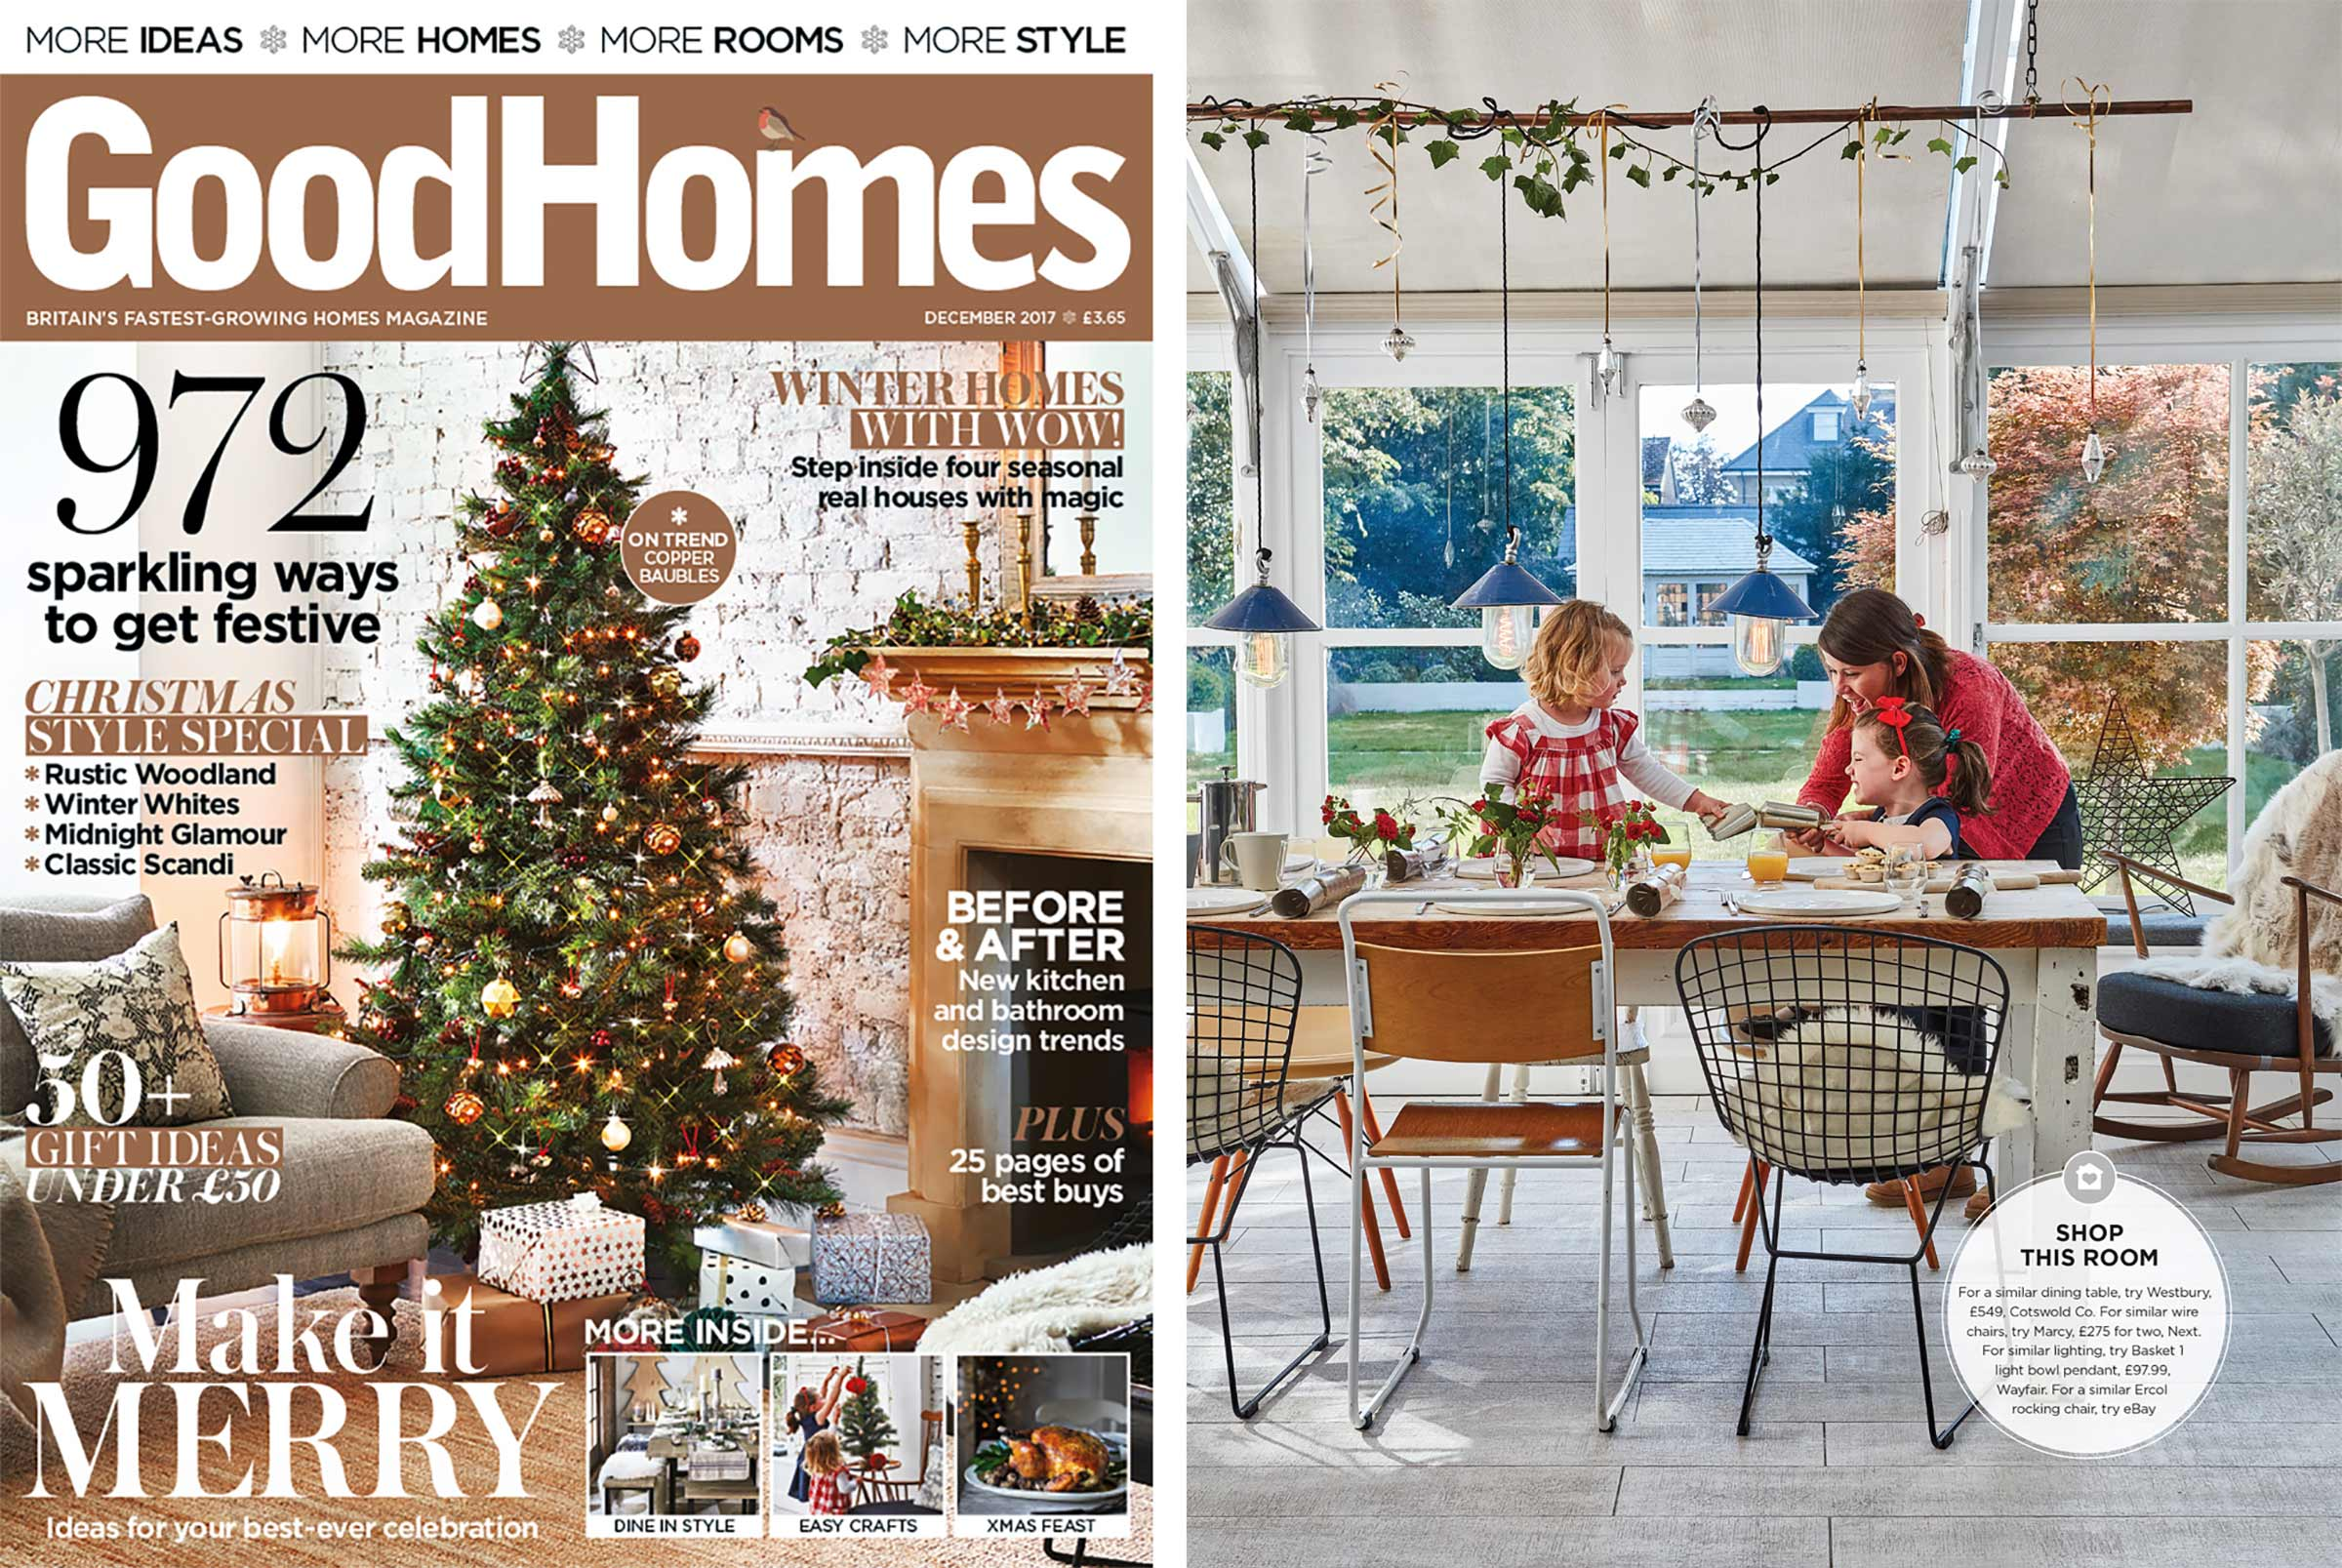 Good+homes+DEC_COVER.jpg